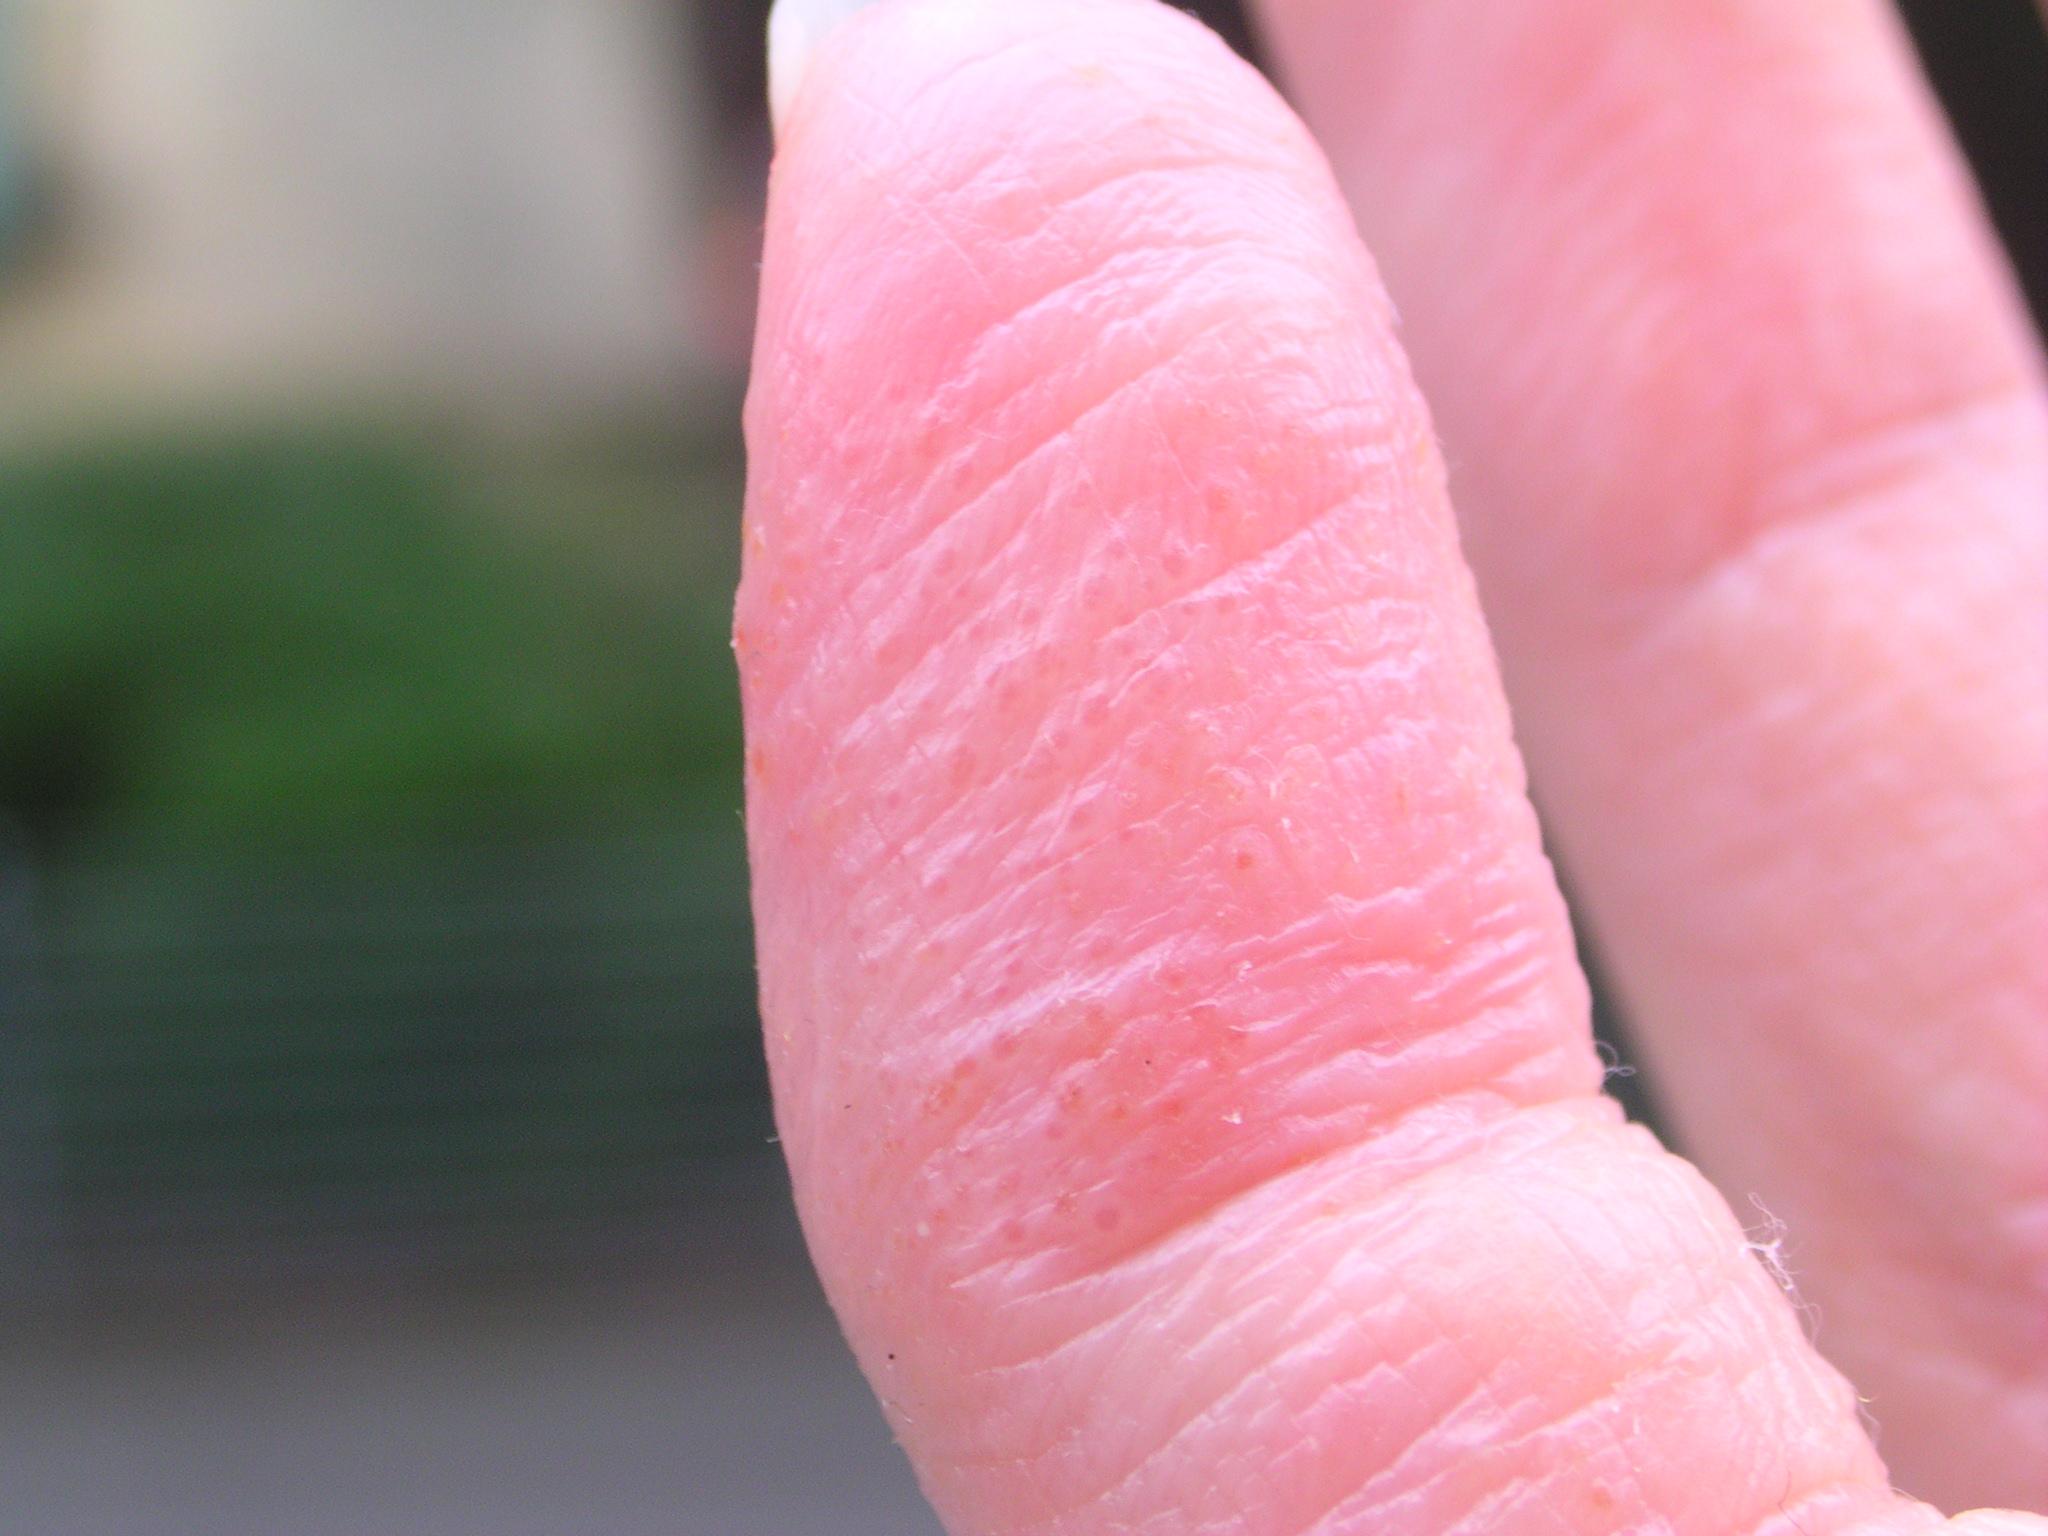 fingers eczema #10